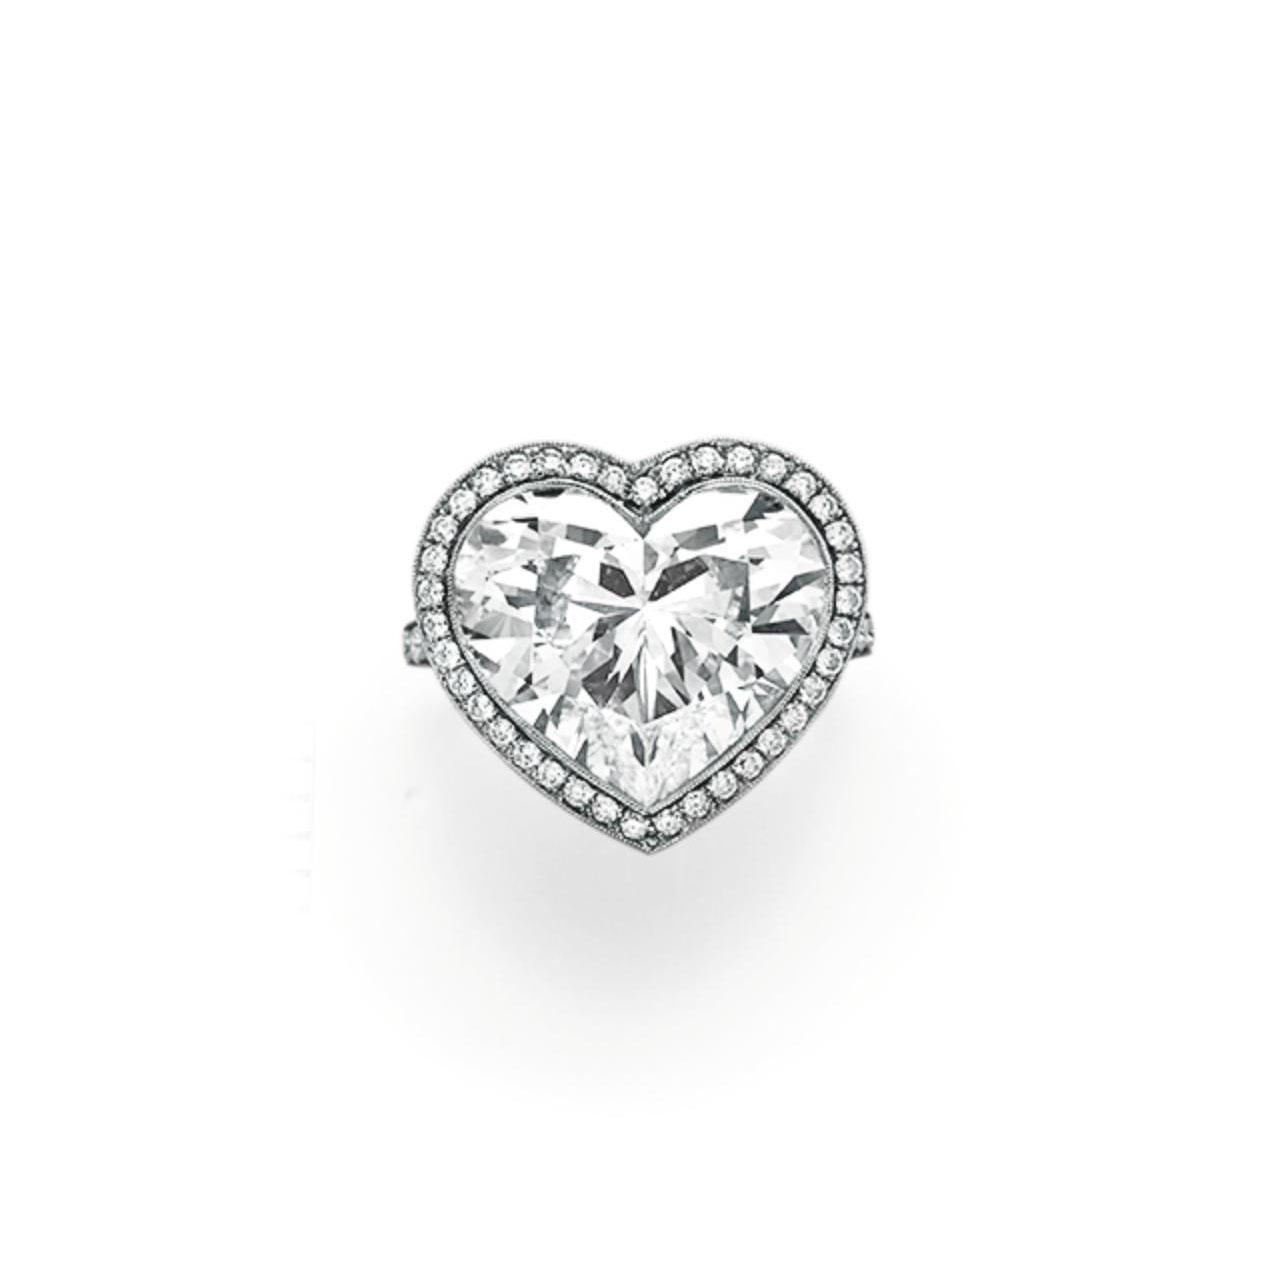 A DIAMOND RING, BY TIFFANY & CO.